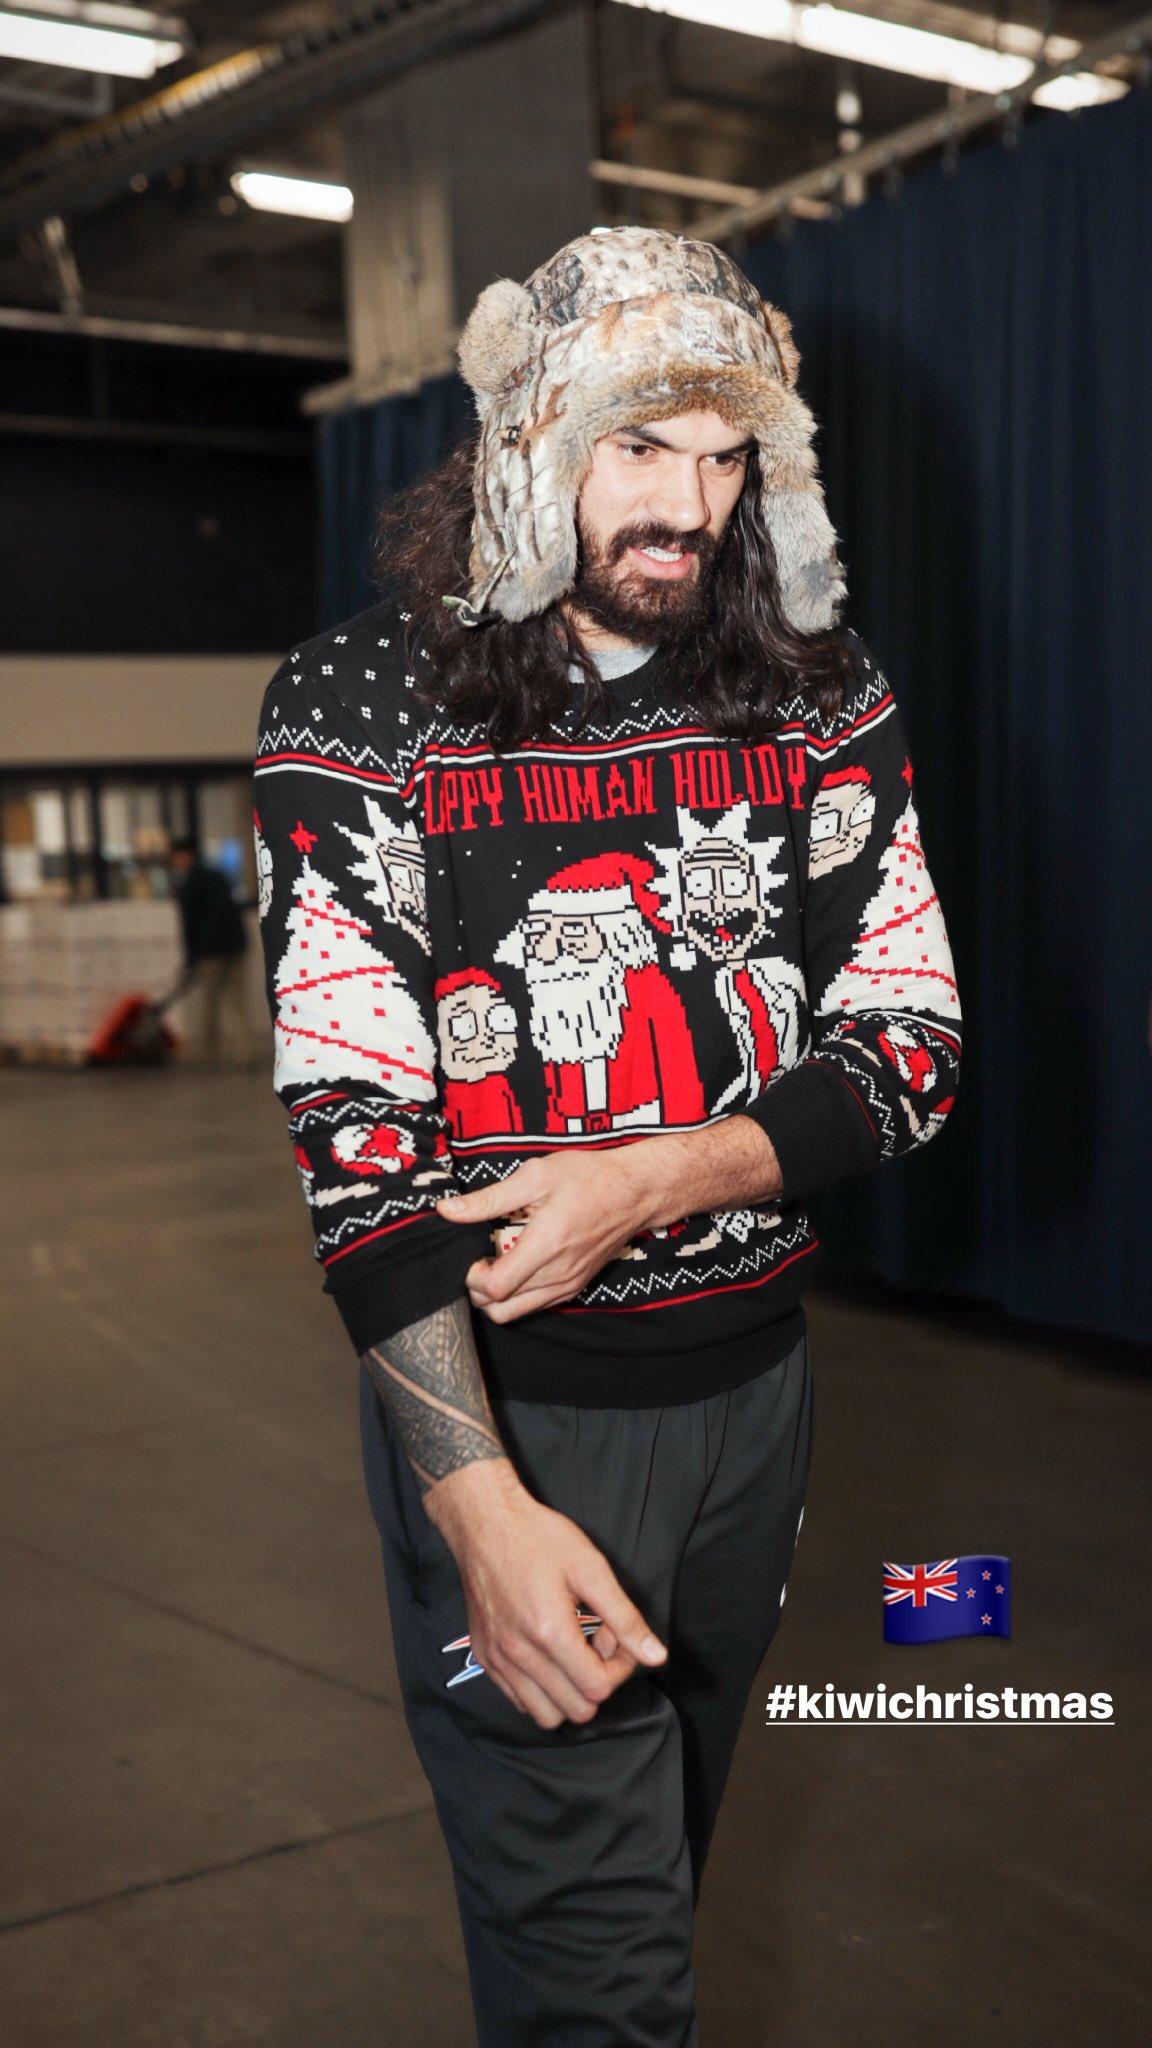 Ugly (the sweater)🎄 #KiwiChristmas @RealStevenAdams #NBAVote #RetweetsCountAsVotes https://t.co/BCt0oveFs1